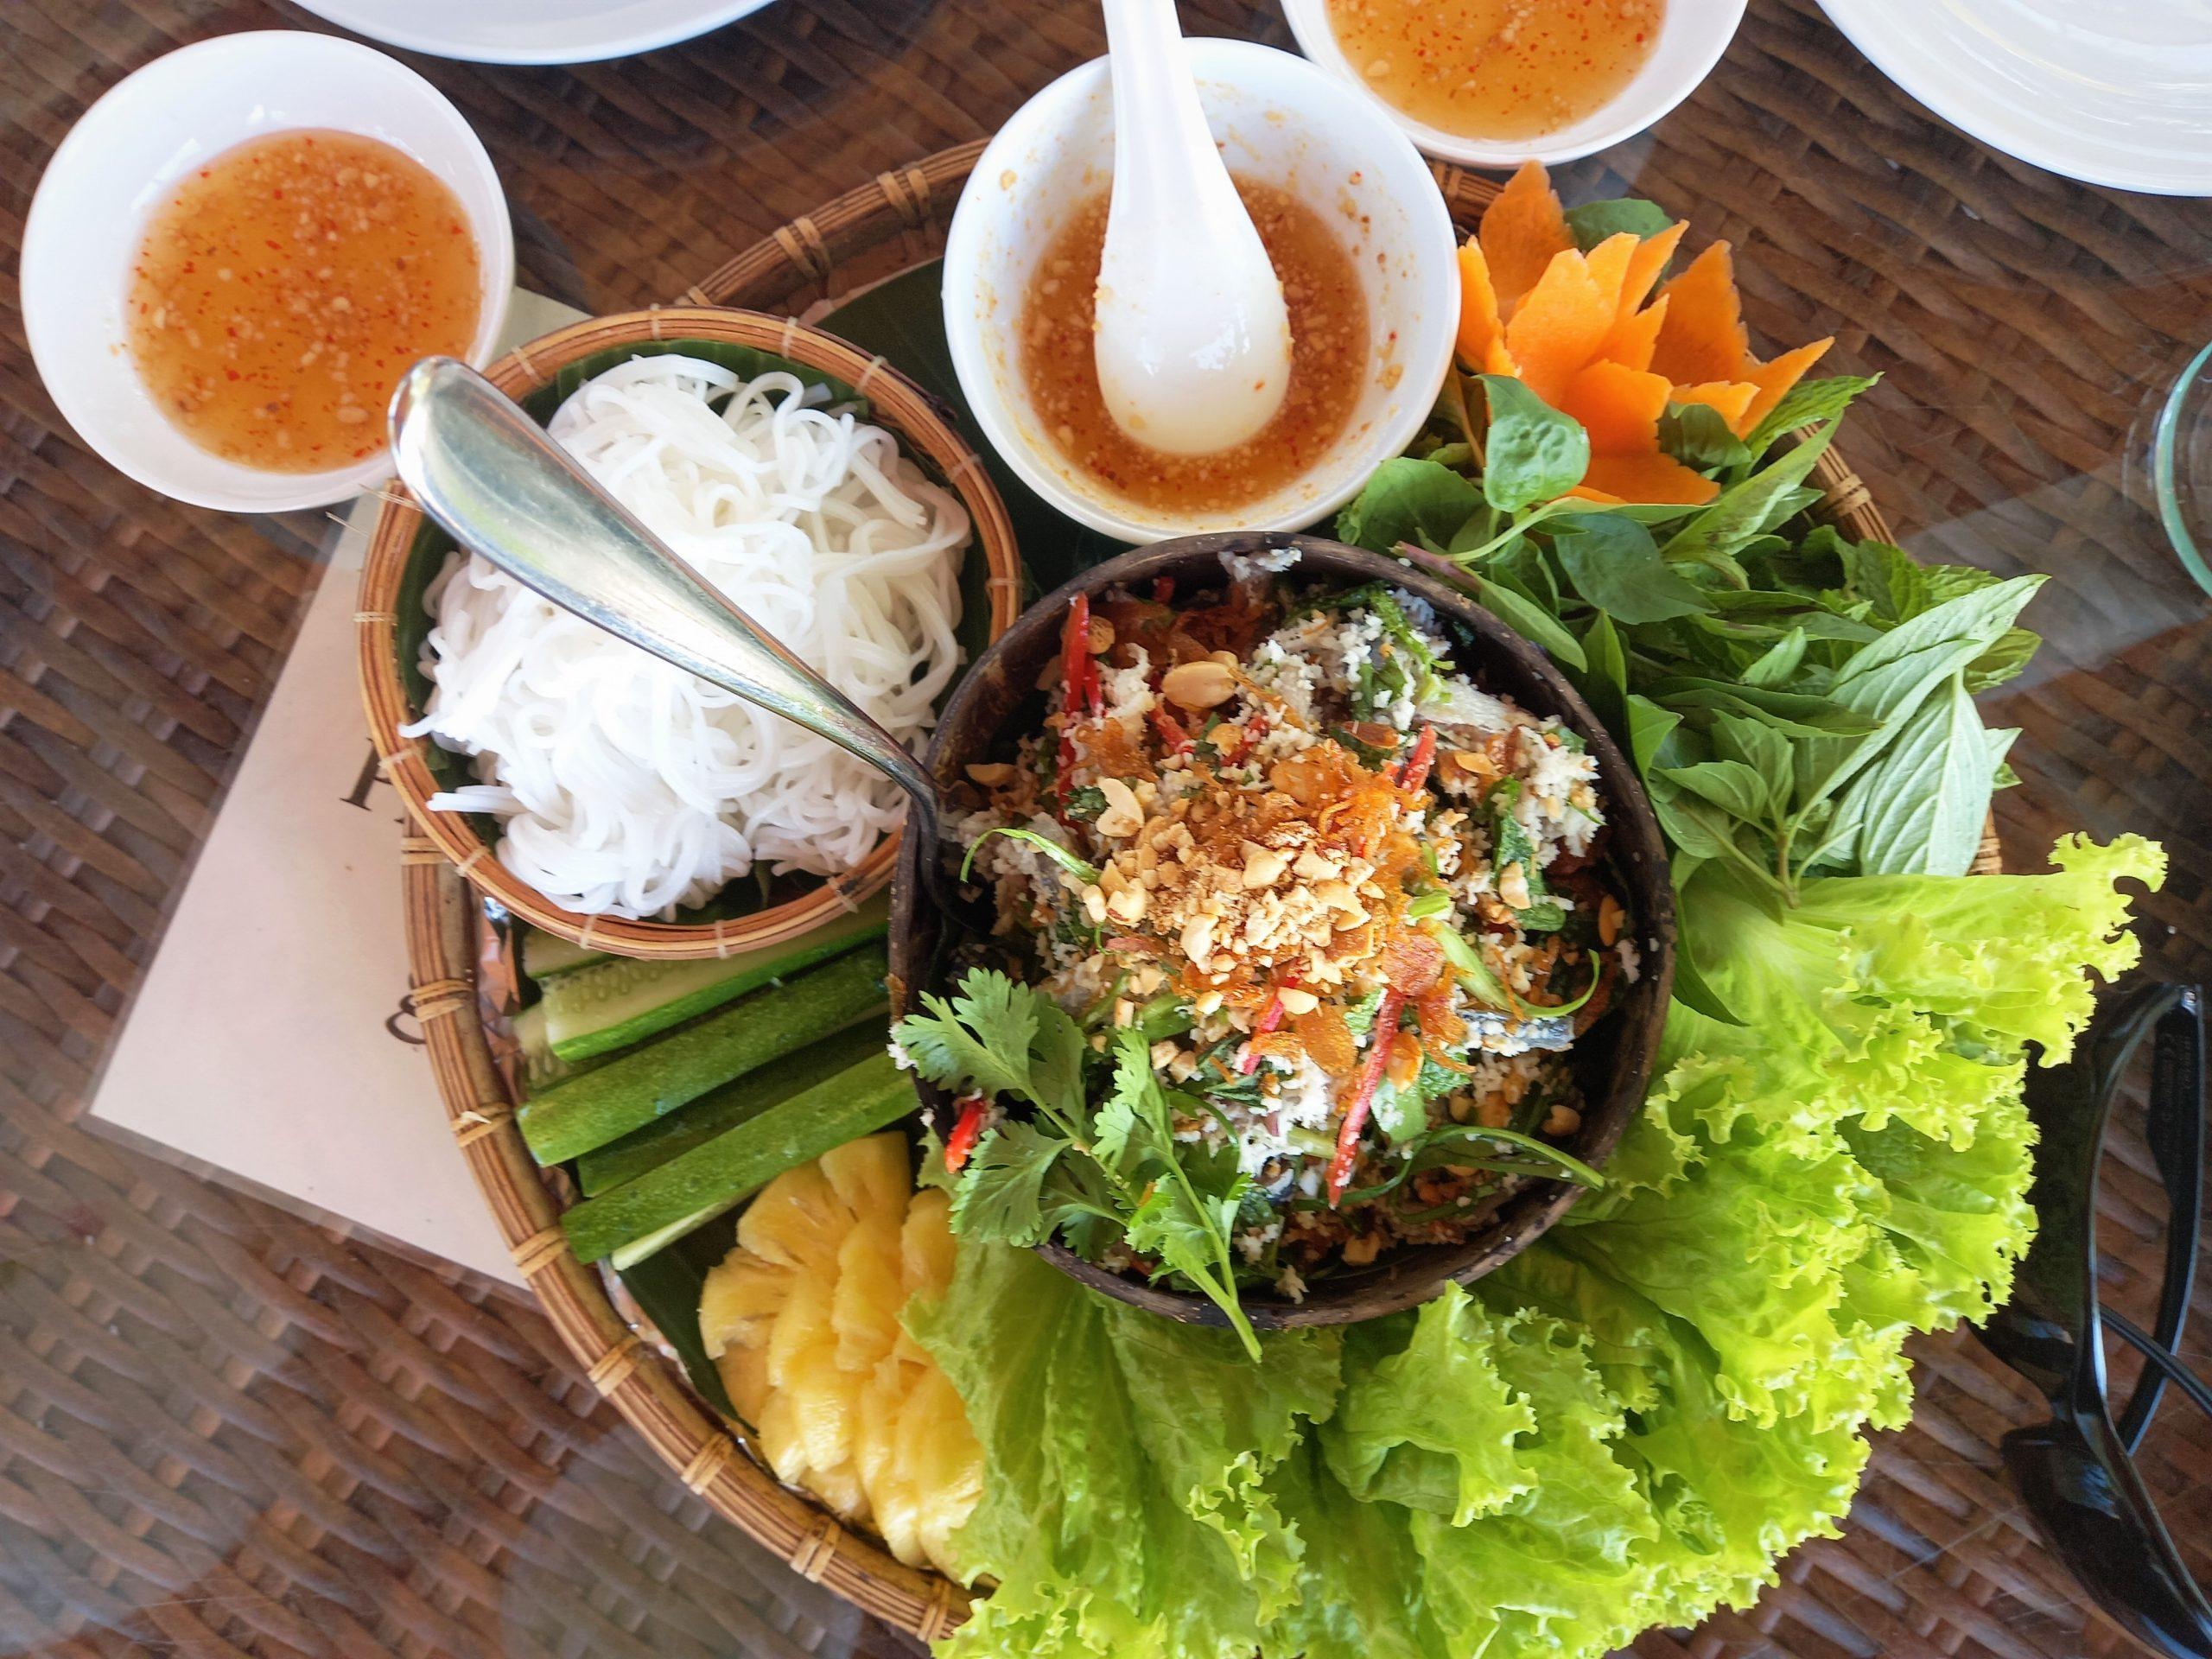 Herring salad at Gold Coast Resort, Phu Quoc Island, Vietnam